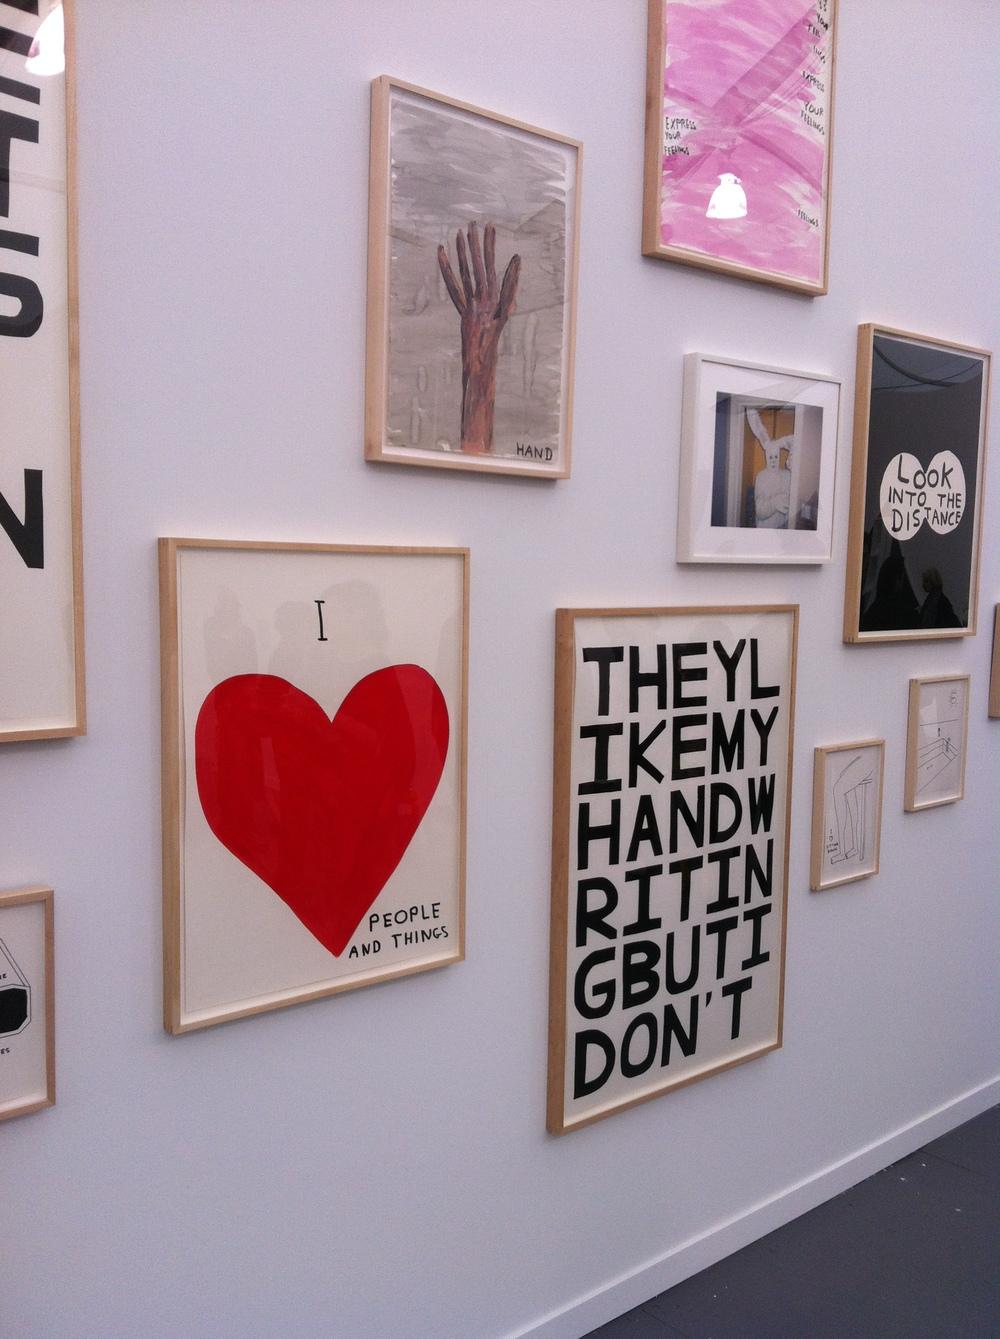 David Shrigley installation shown at the Anton Kern booth